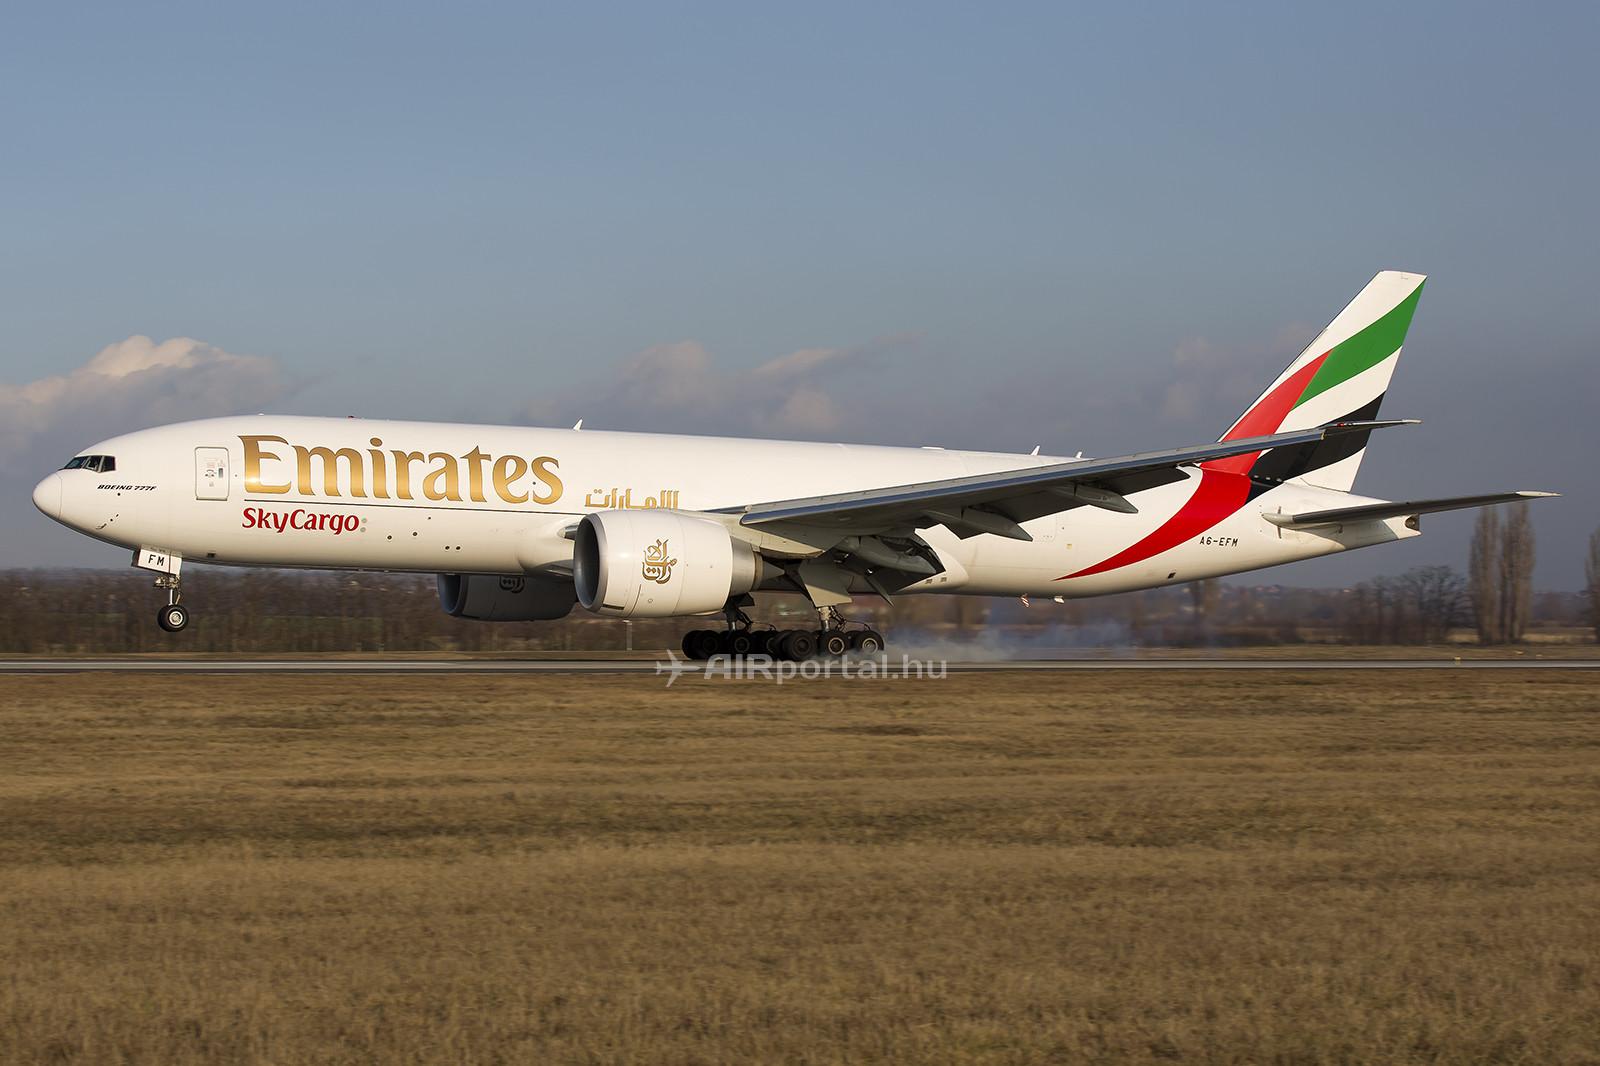 Az Emirates SkyCargo Boeing 777-es repülőgépe Budapesten. (Fotó: AIRportal.hu)   © AIRportal.hu